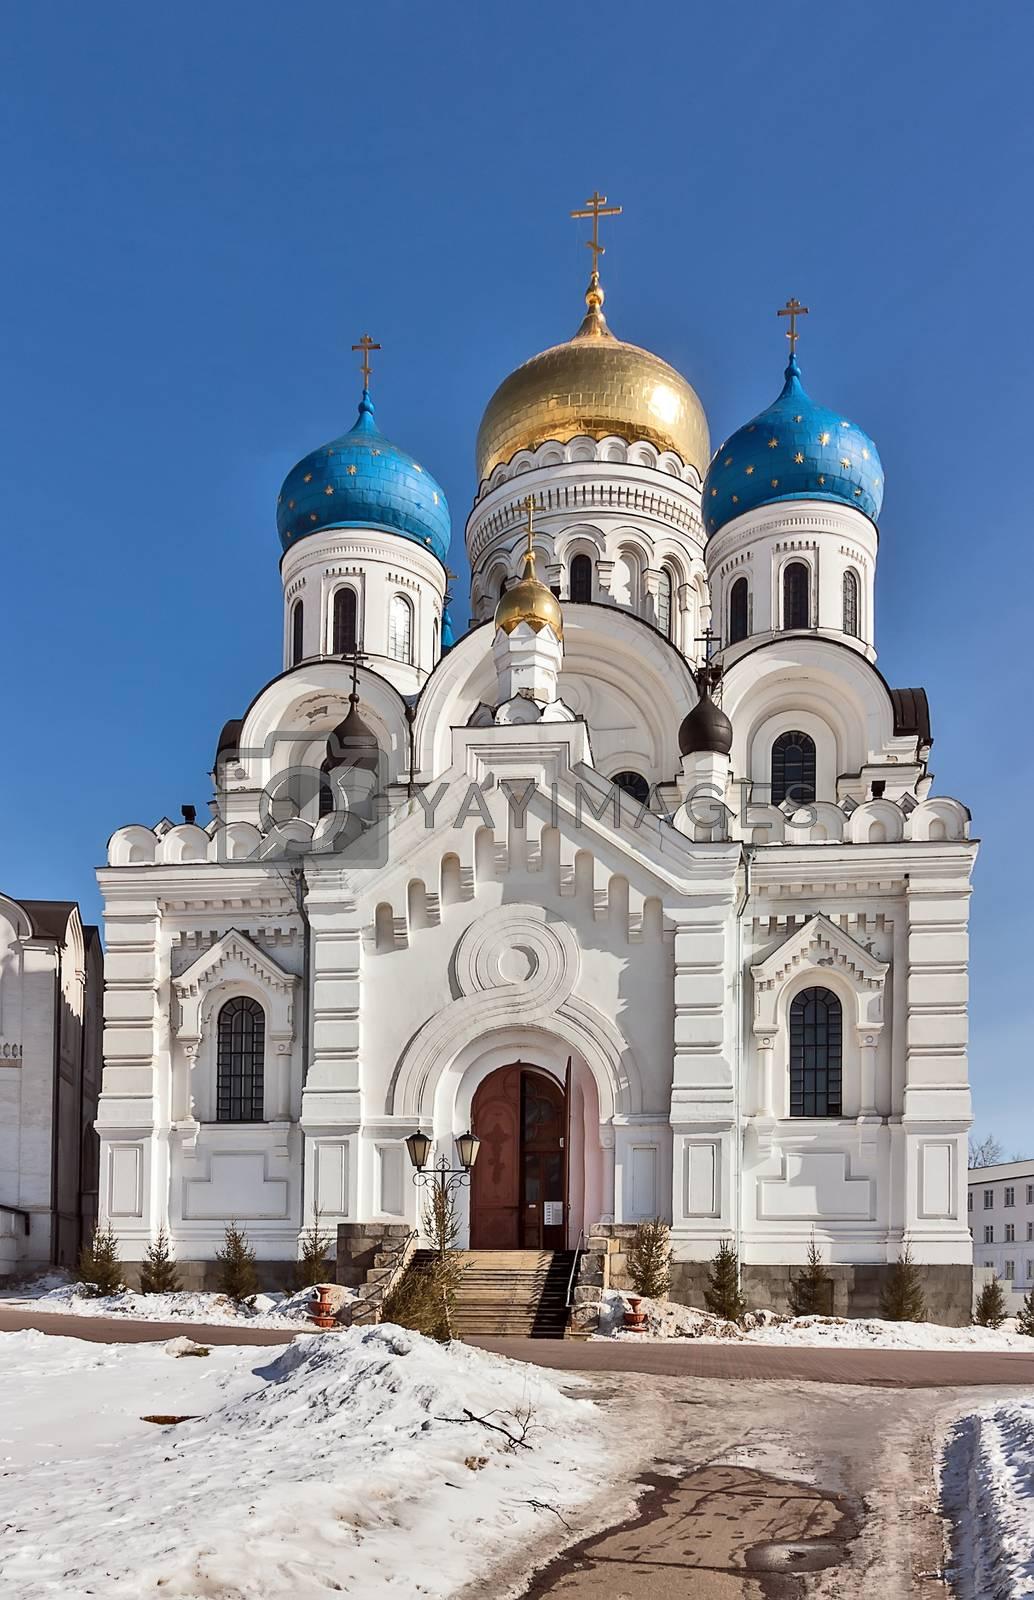 Nikolo-Ugreshsky Monastery, Moscow region, Russia by borisb17